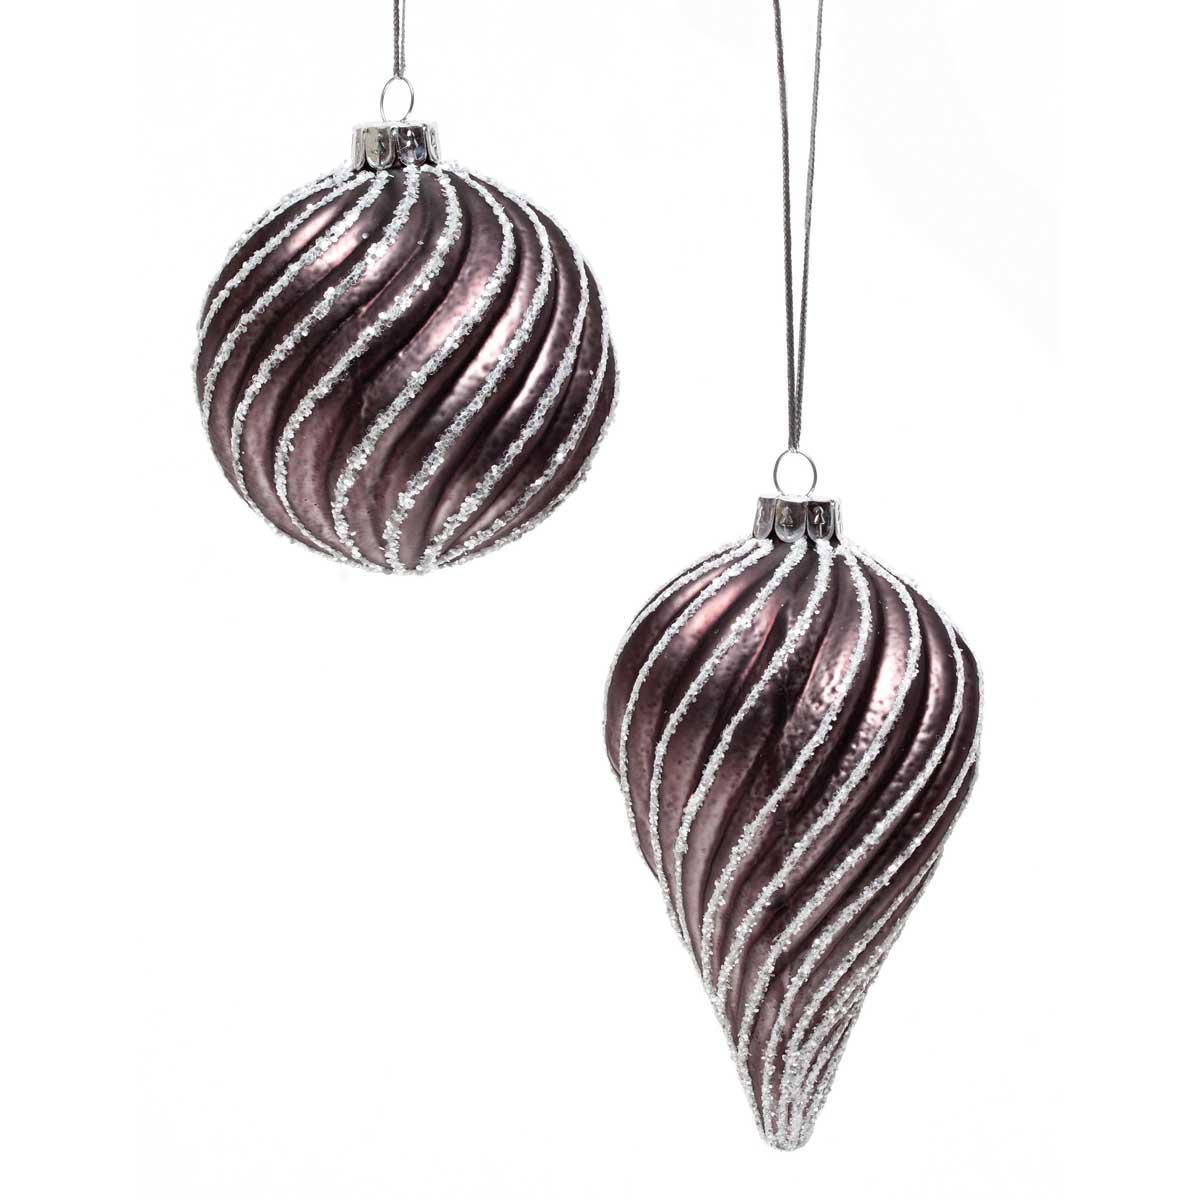 2 Piece Glass Teardrop/Ball Swirl Ornament Set